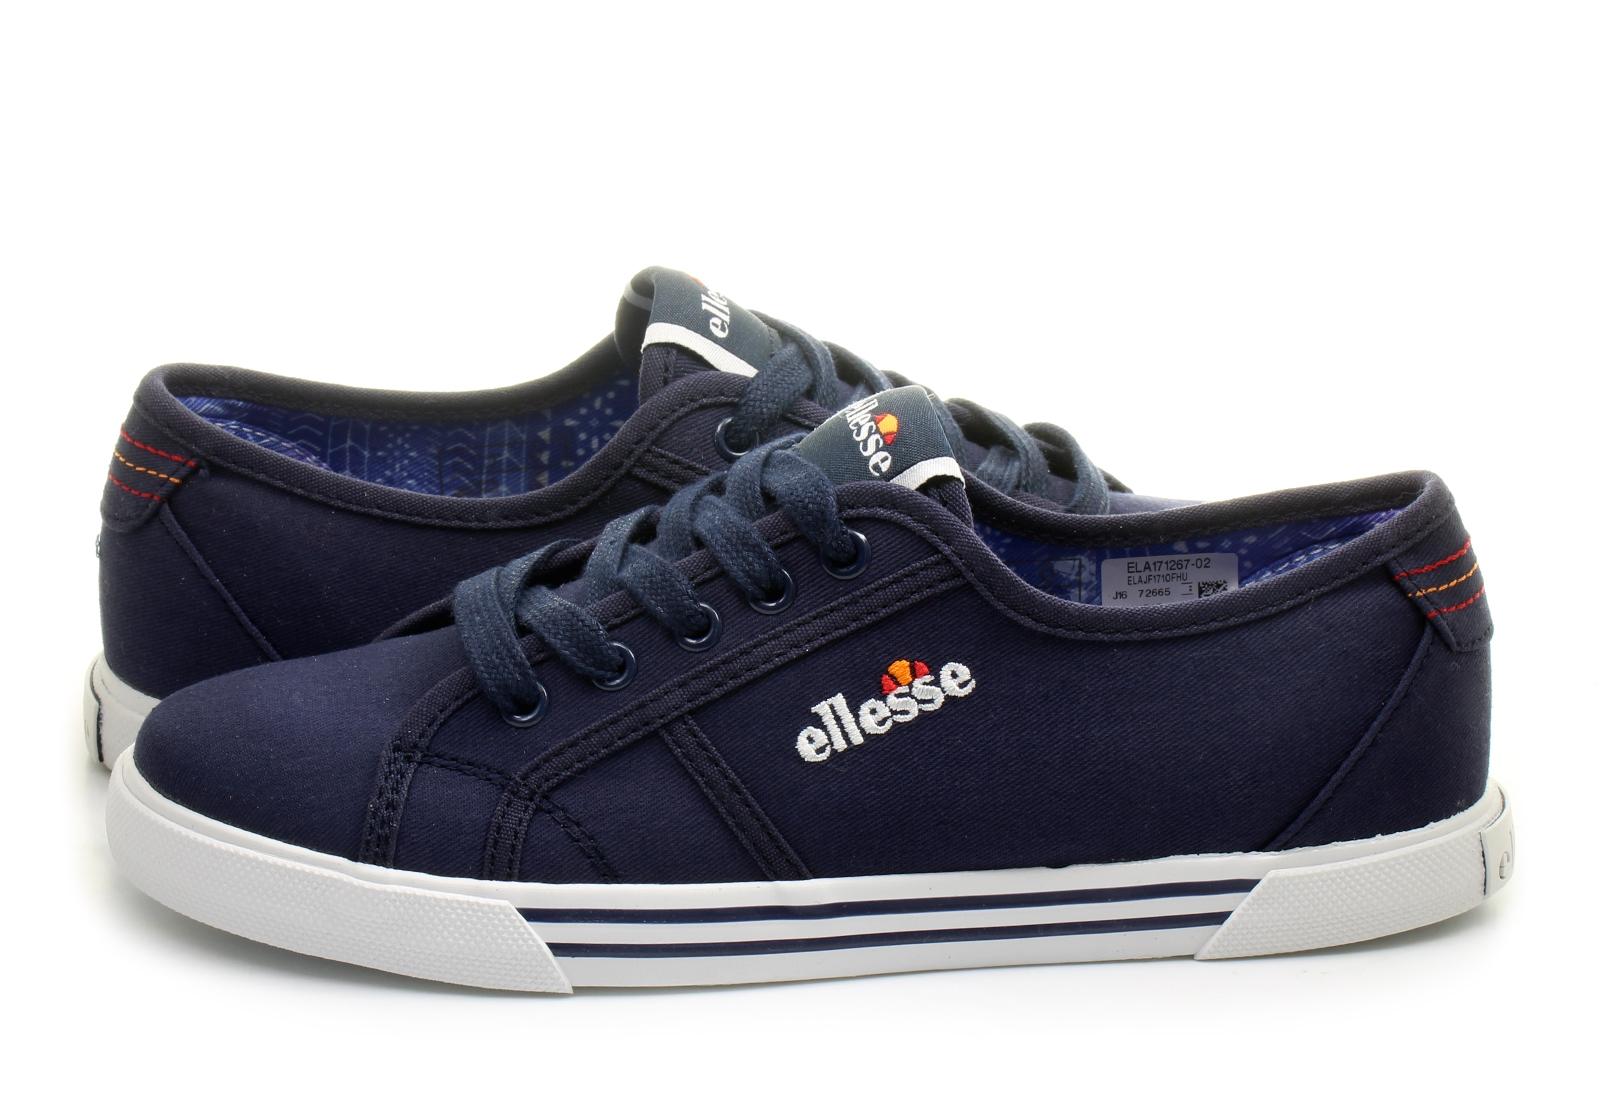 Velcro Black Shoes Kid